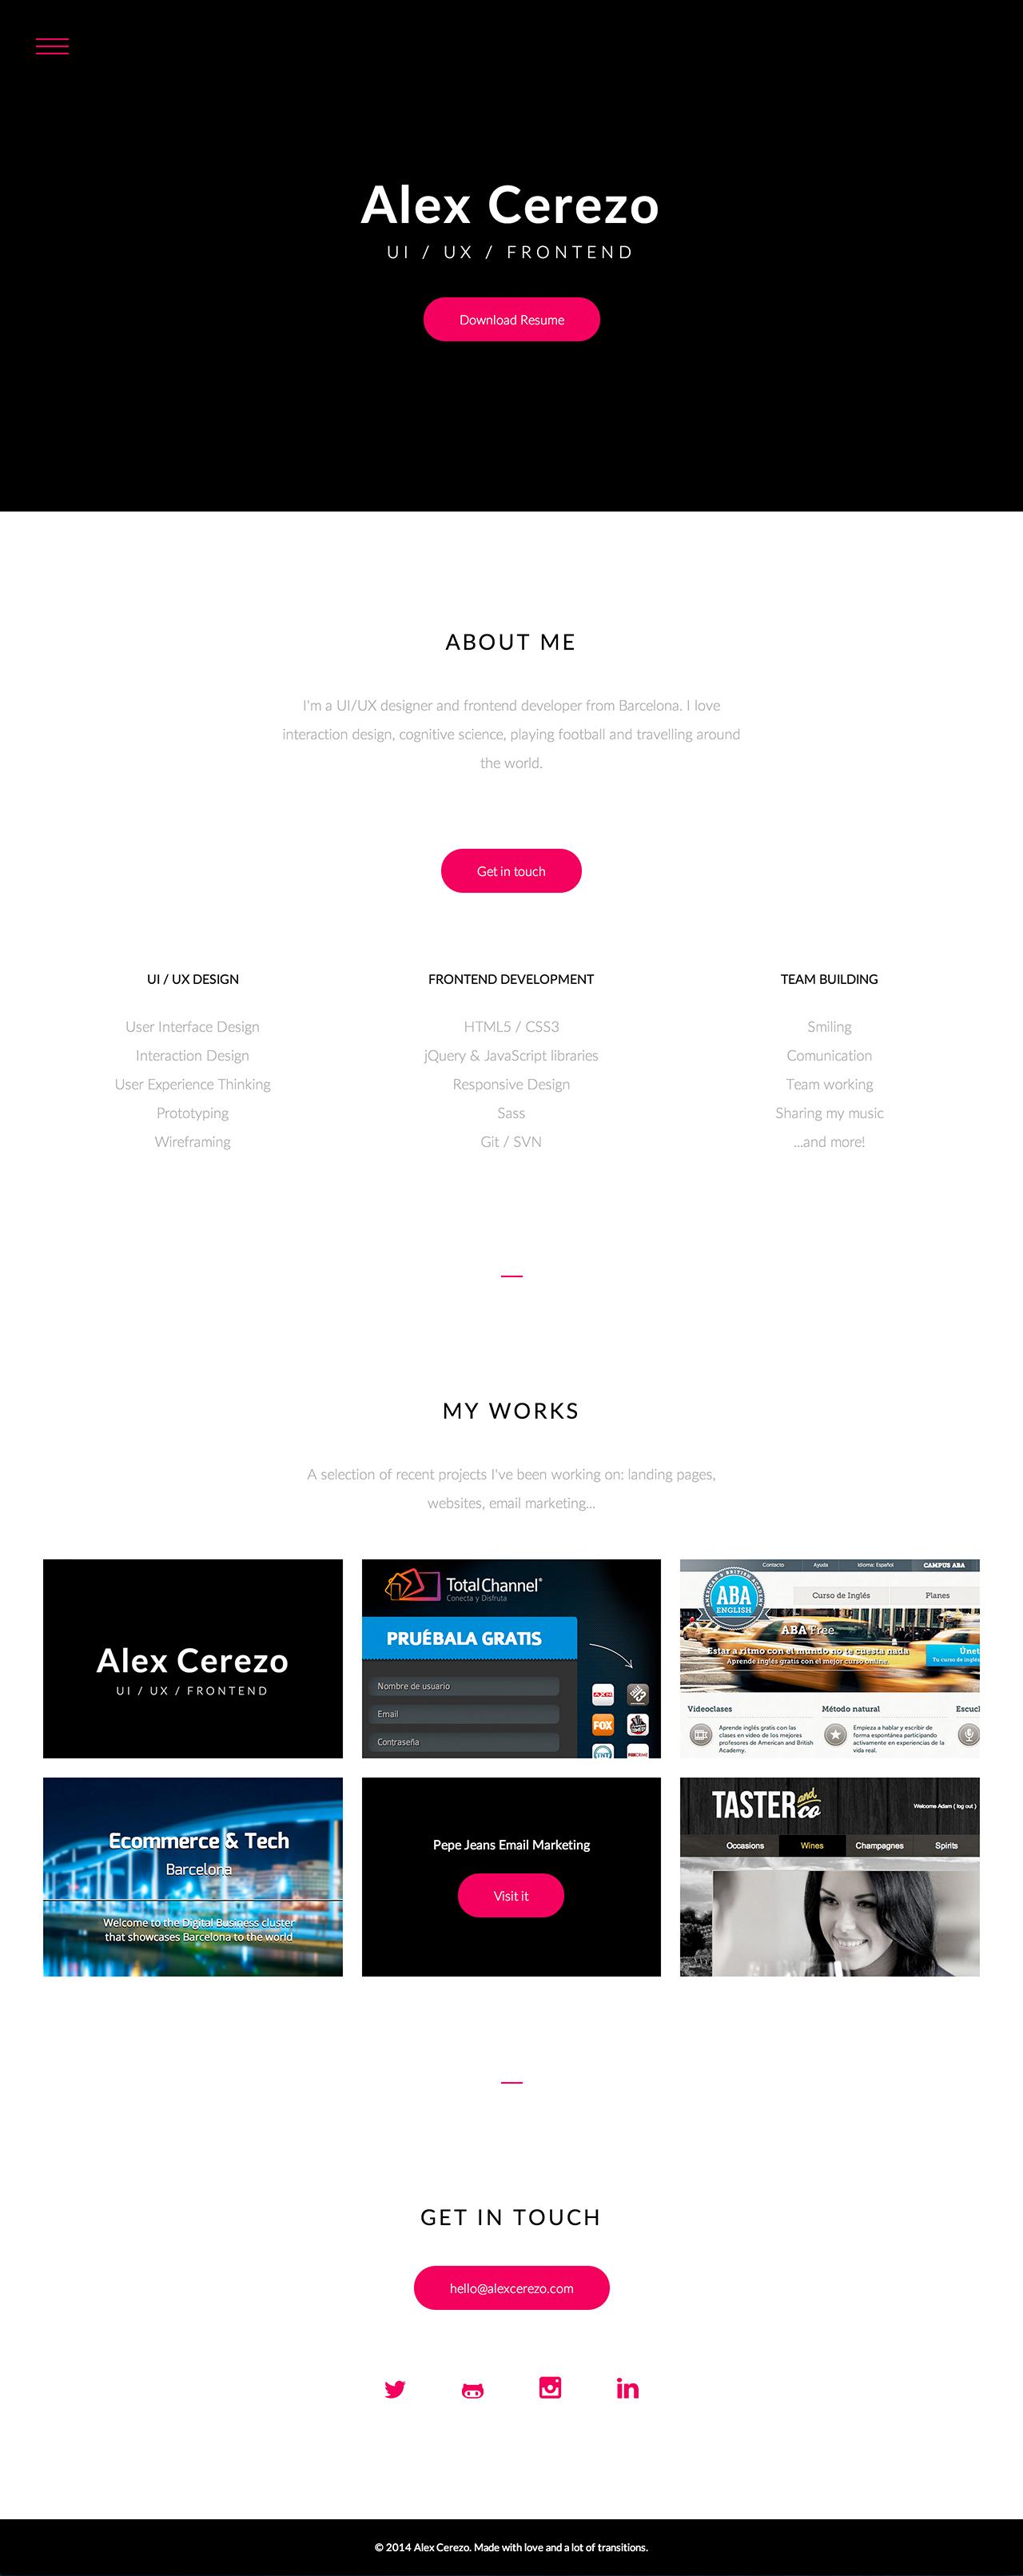 Alex Cerezo Website Screenshot